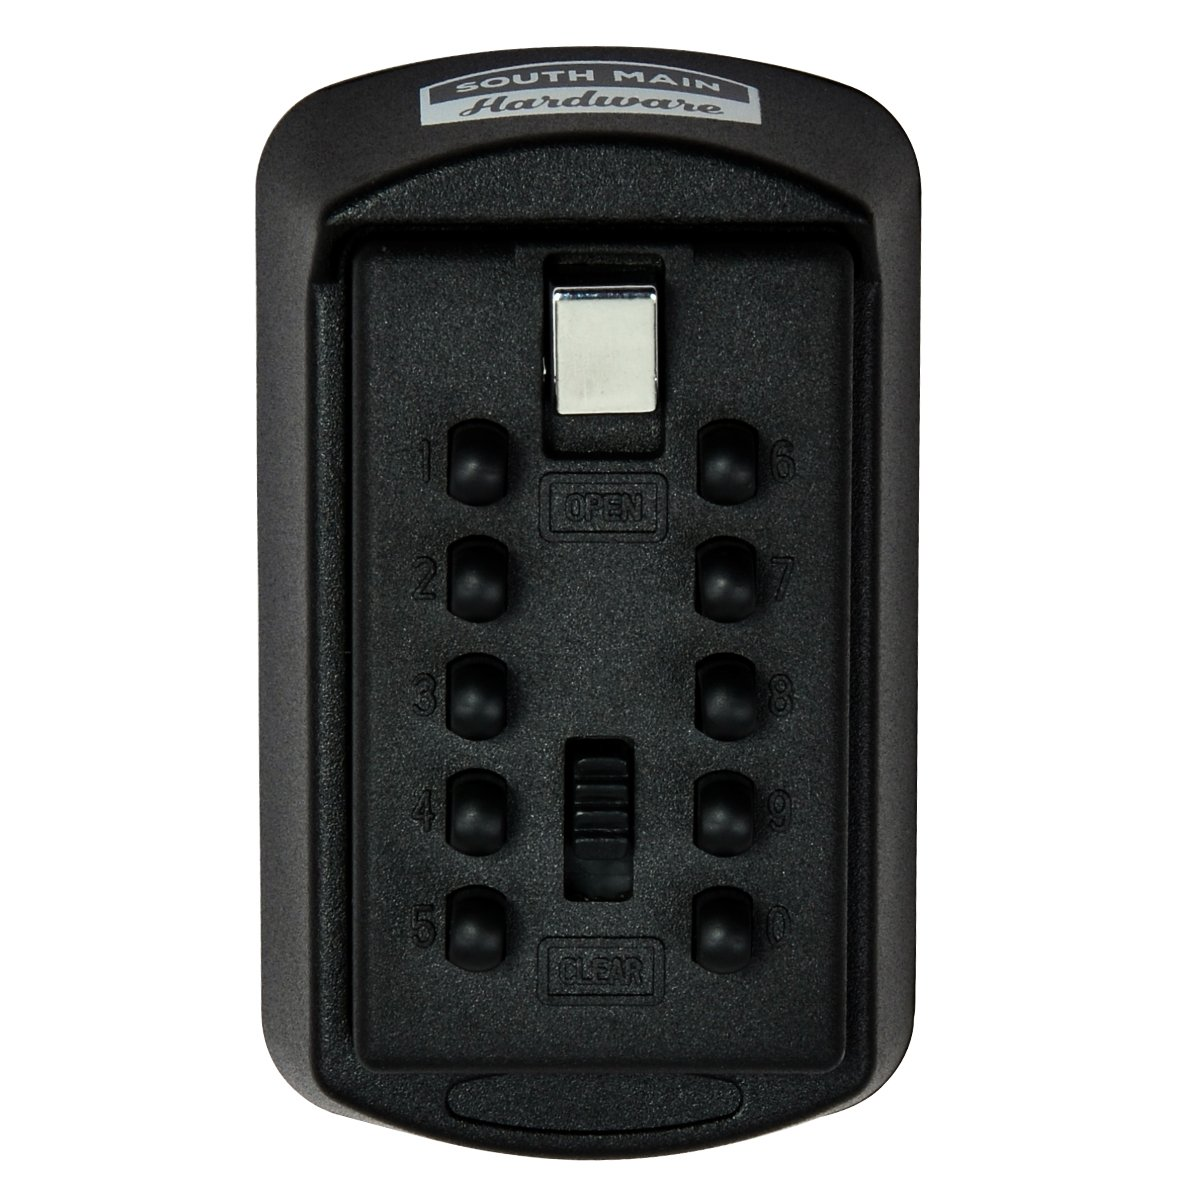 South Main Hardware 810144 Combination Key Storage LOCK Box, Black